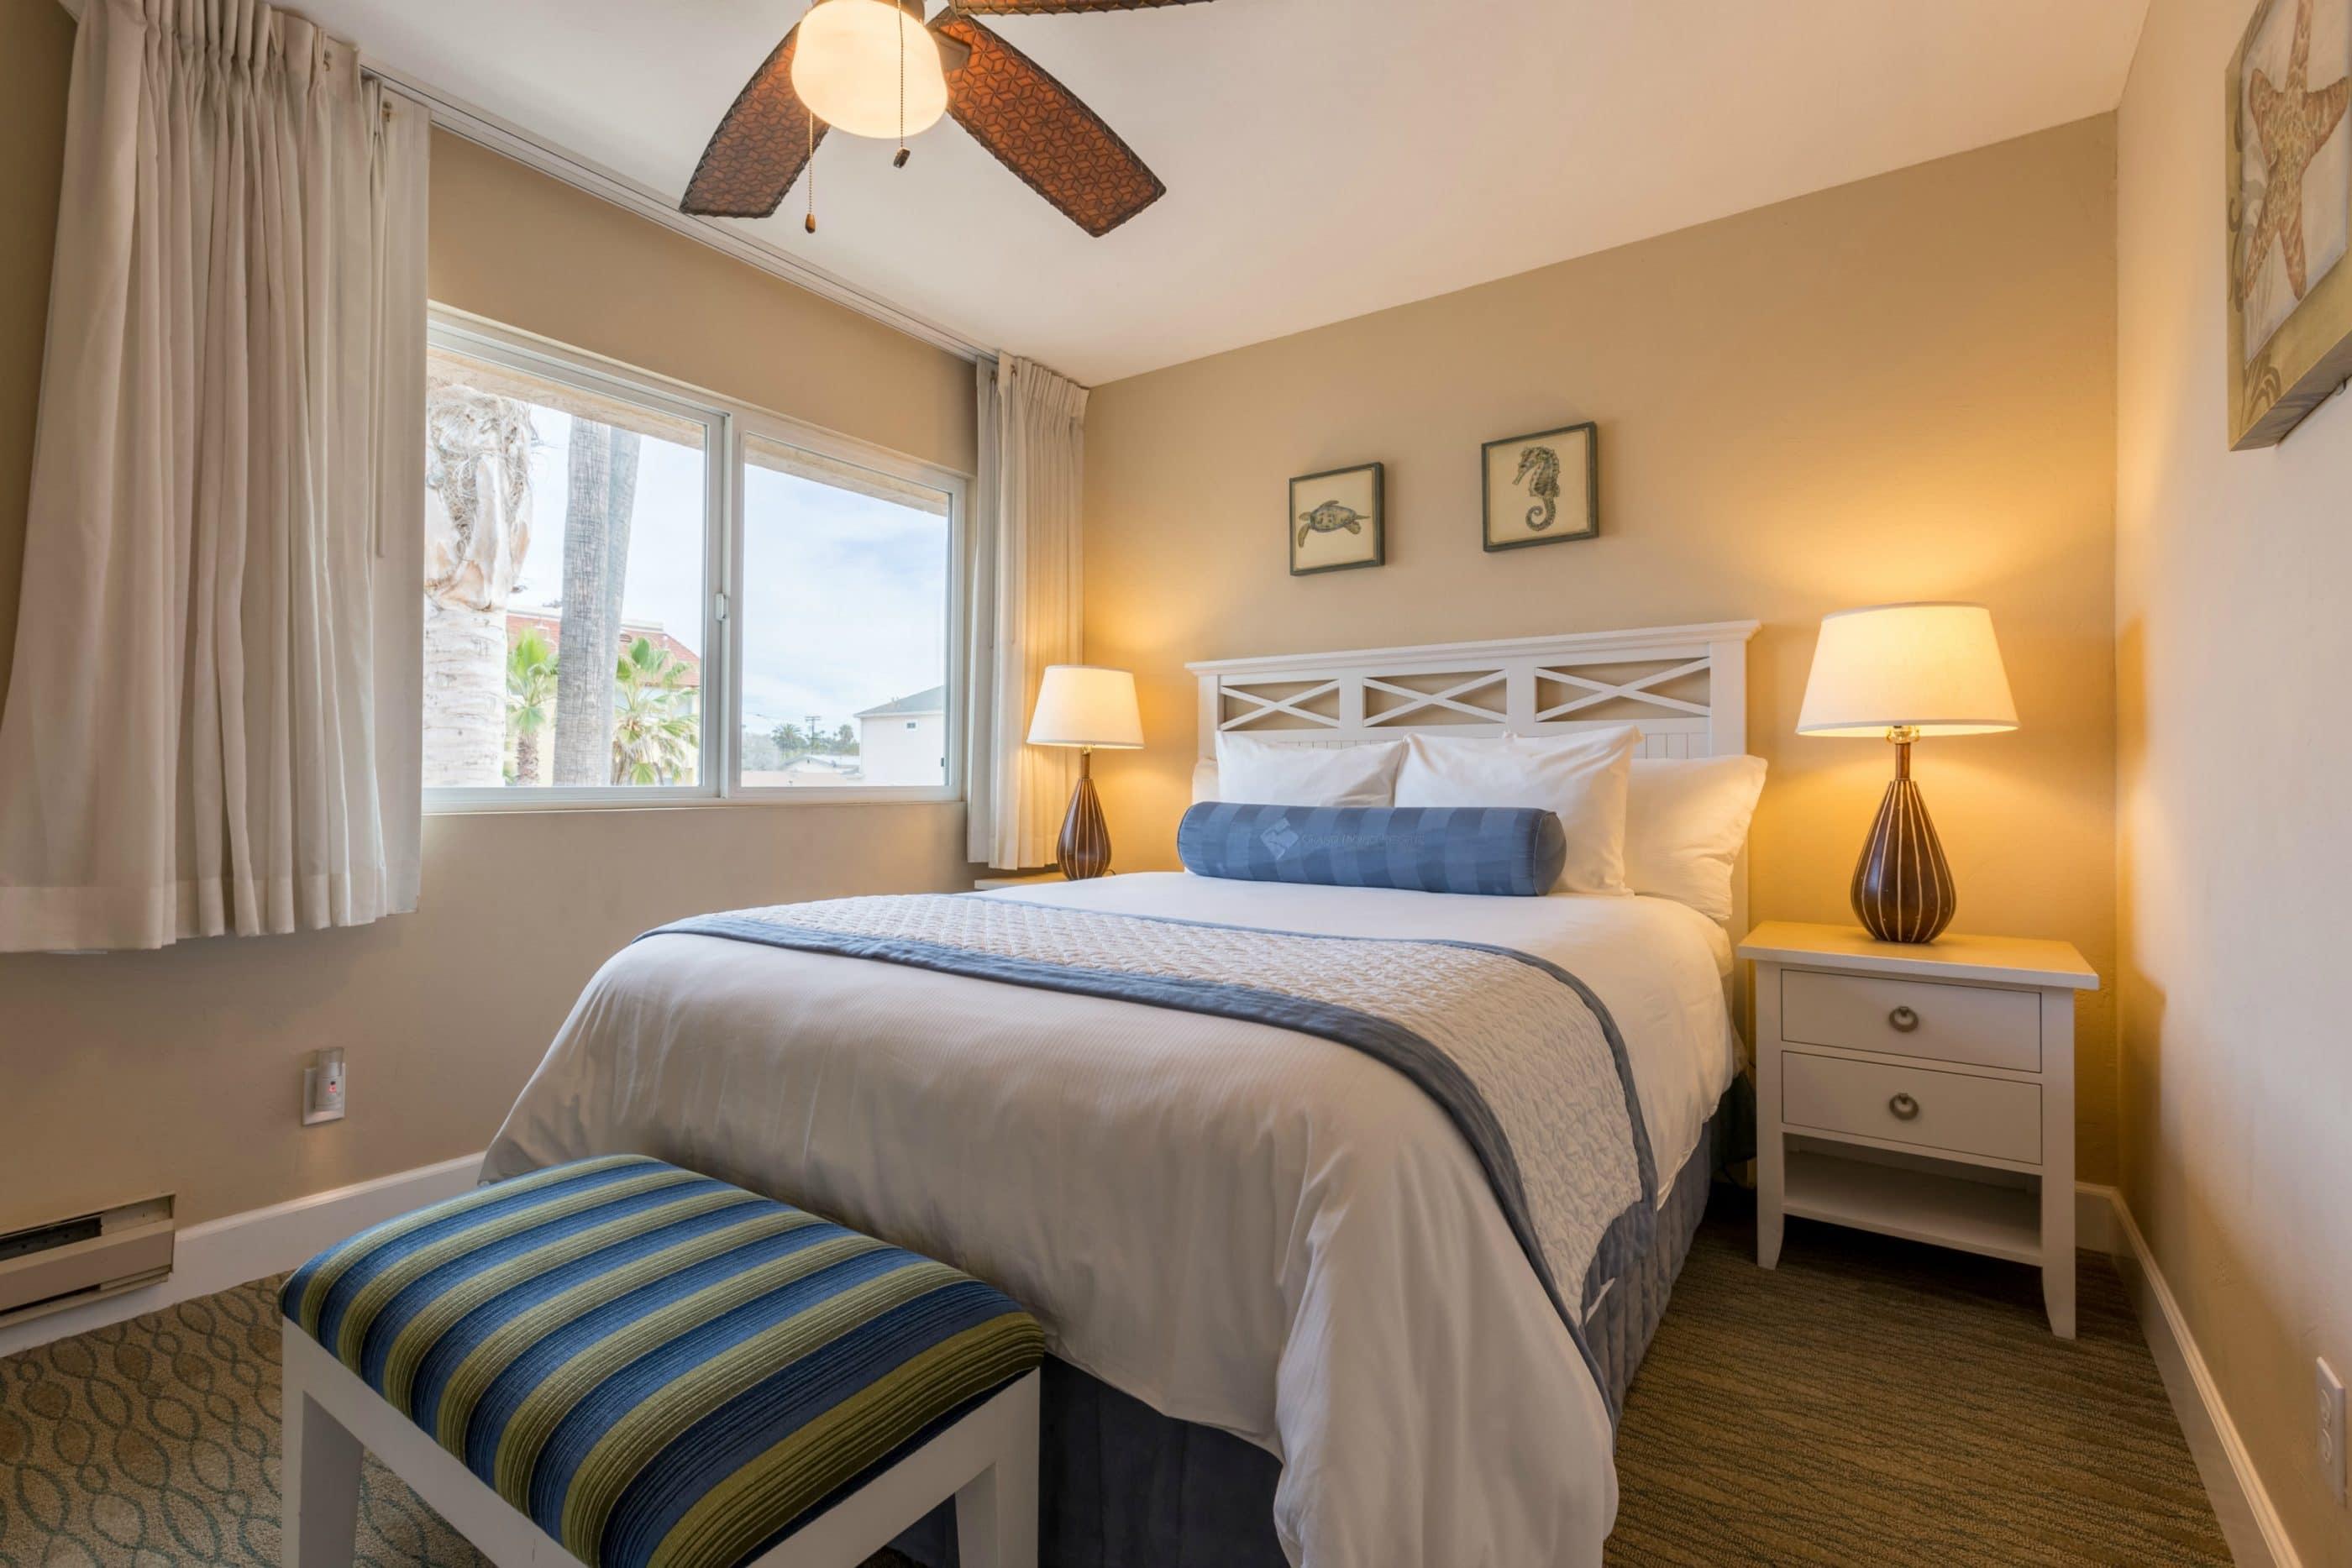 Coastal decor in a bedroom at Southern California Beach Resort a popular San Diego beachfront hotel.